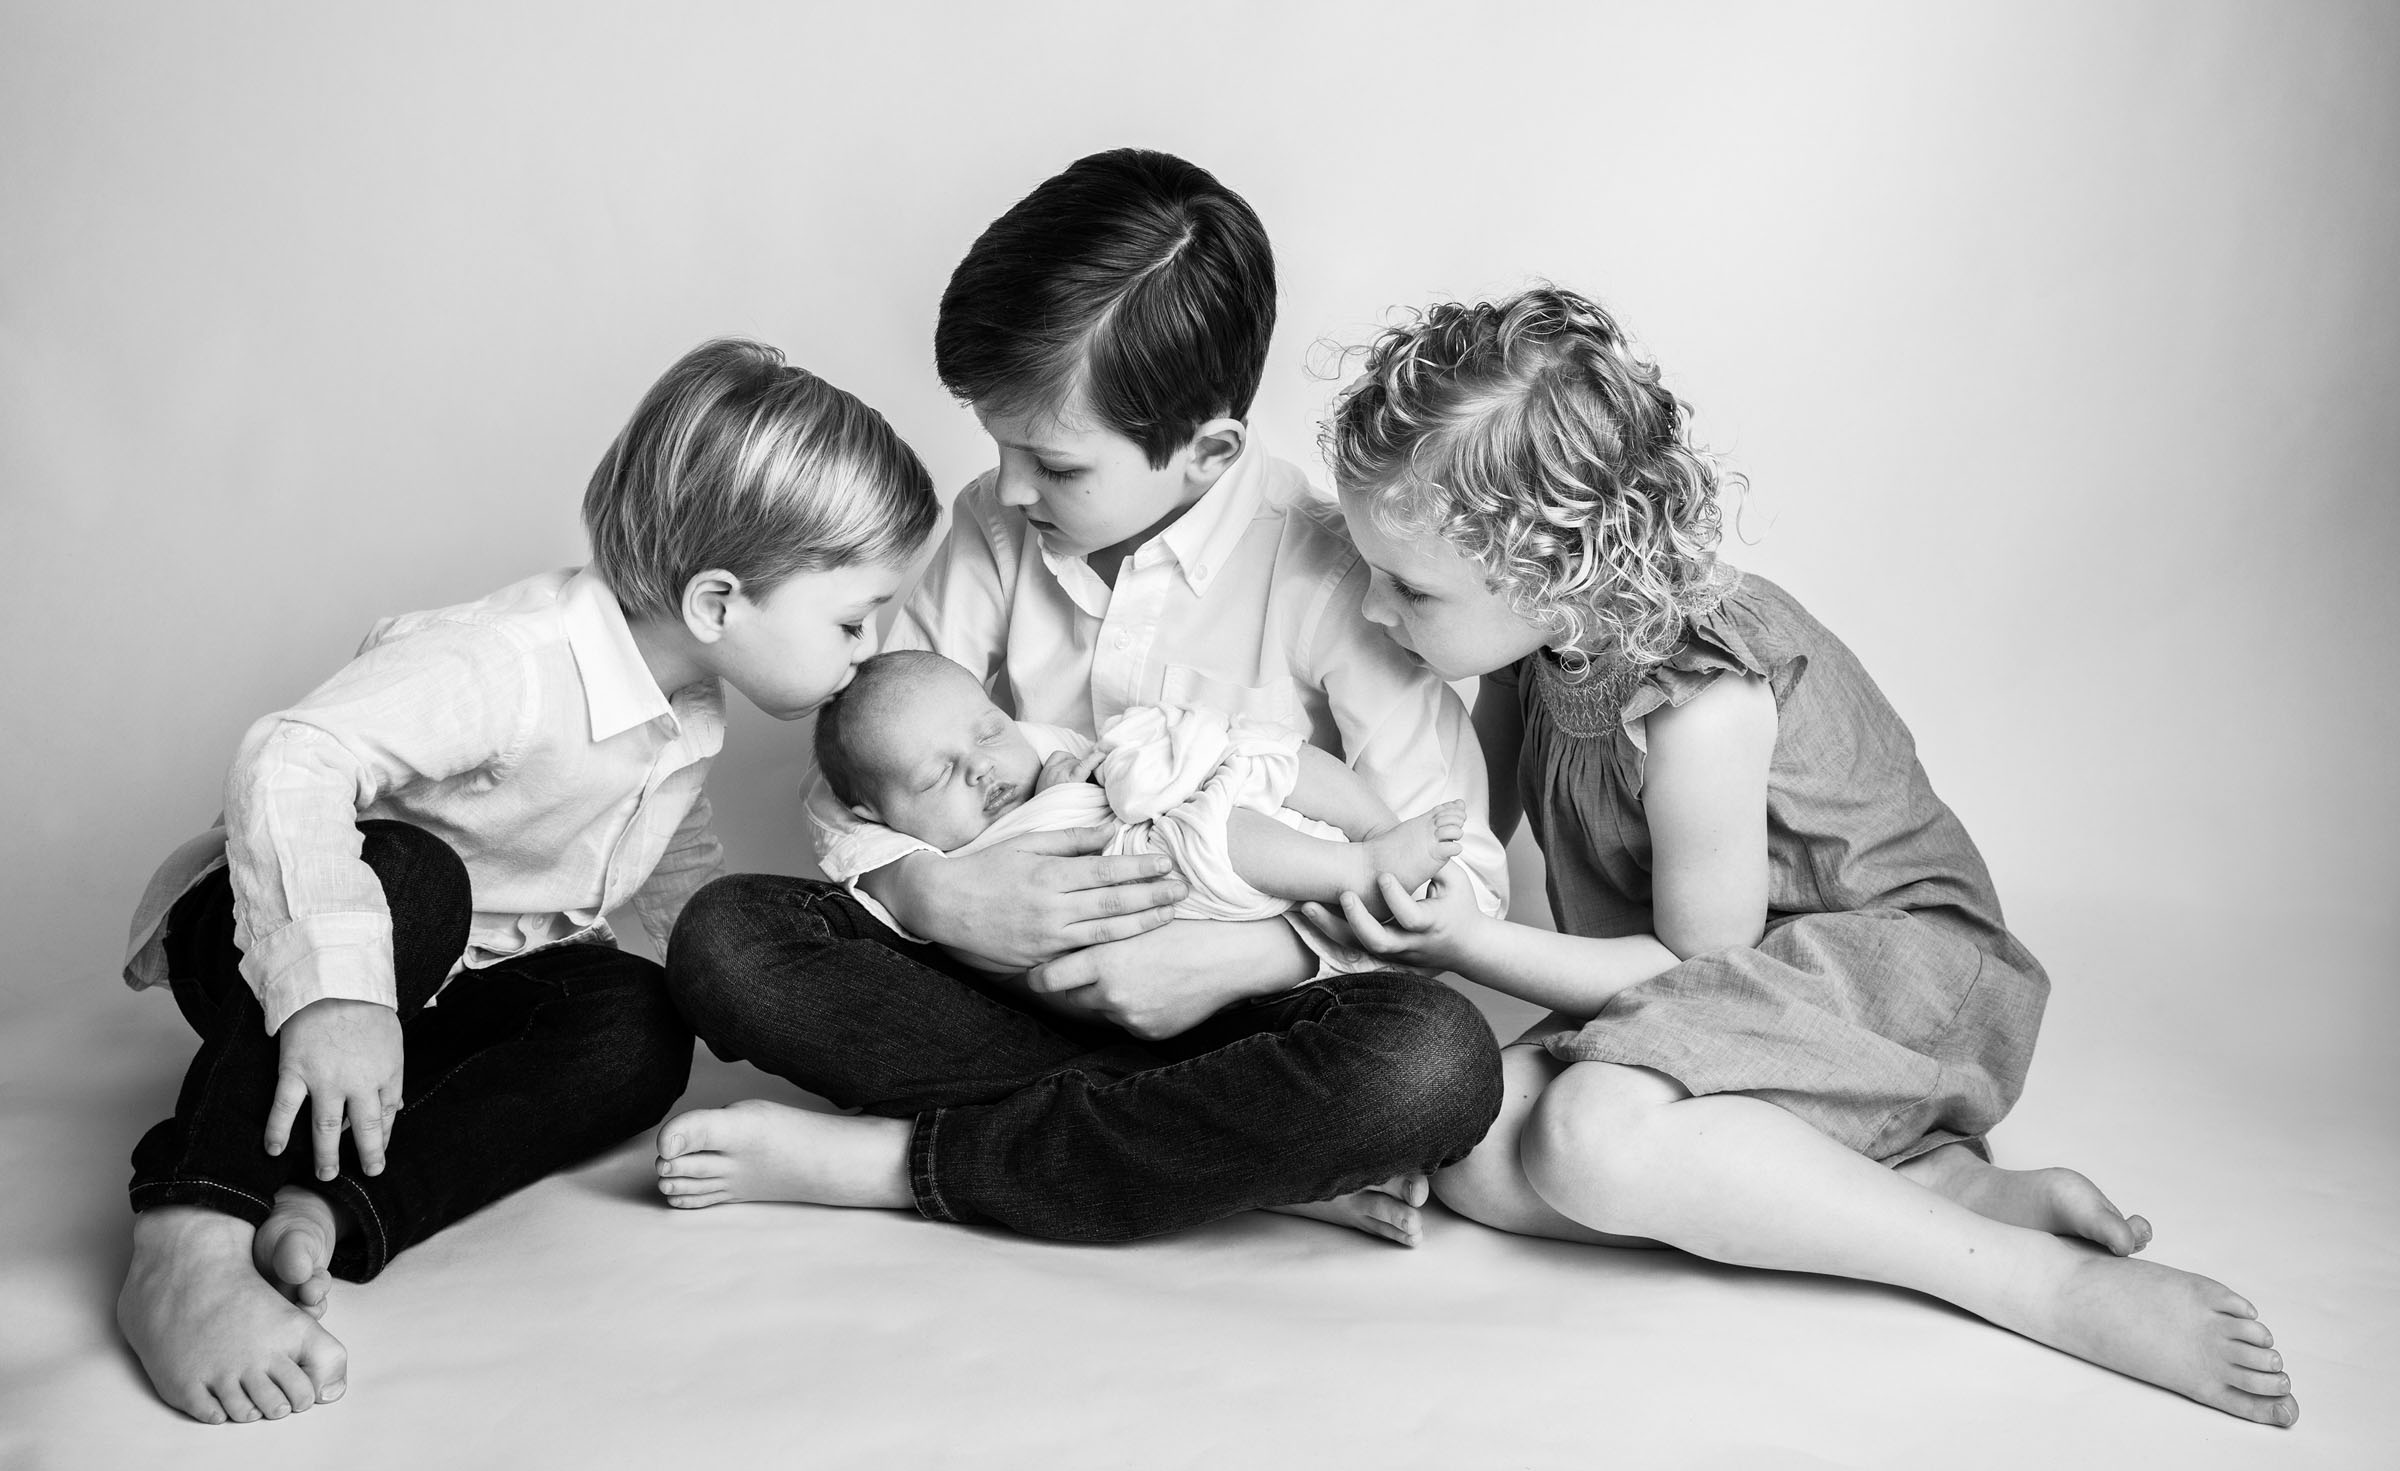 MOS children and newborns